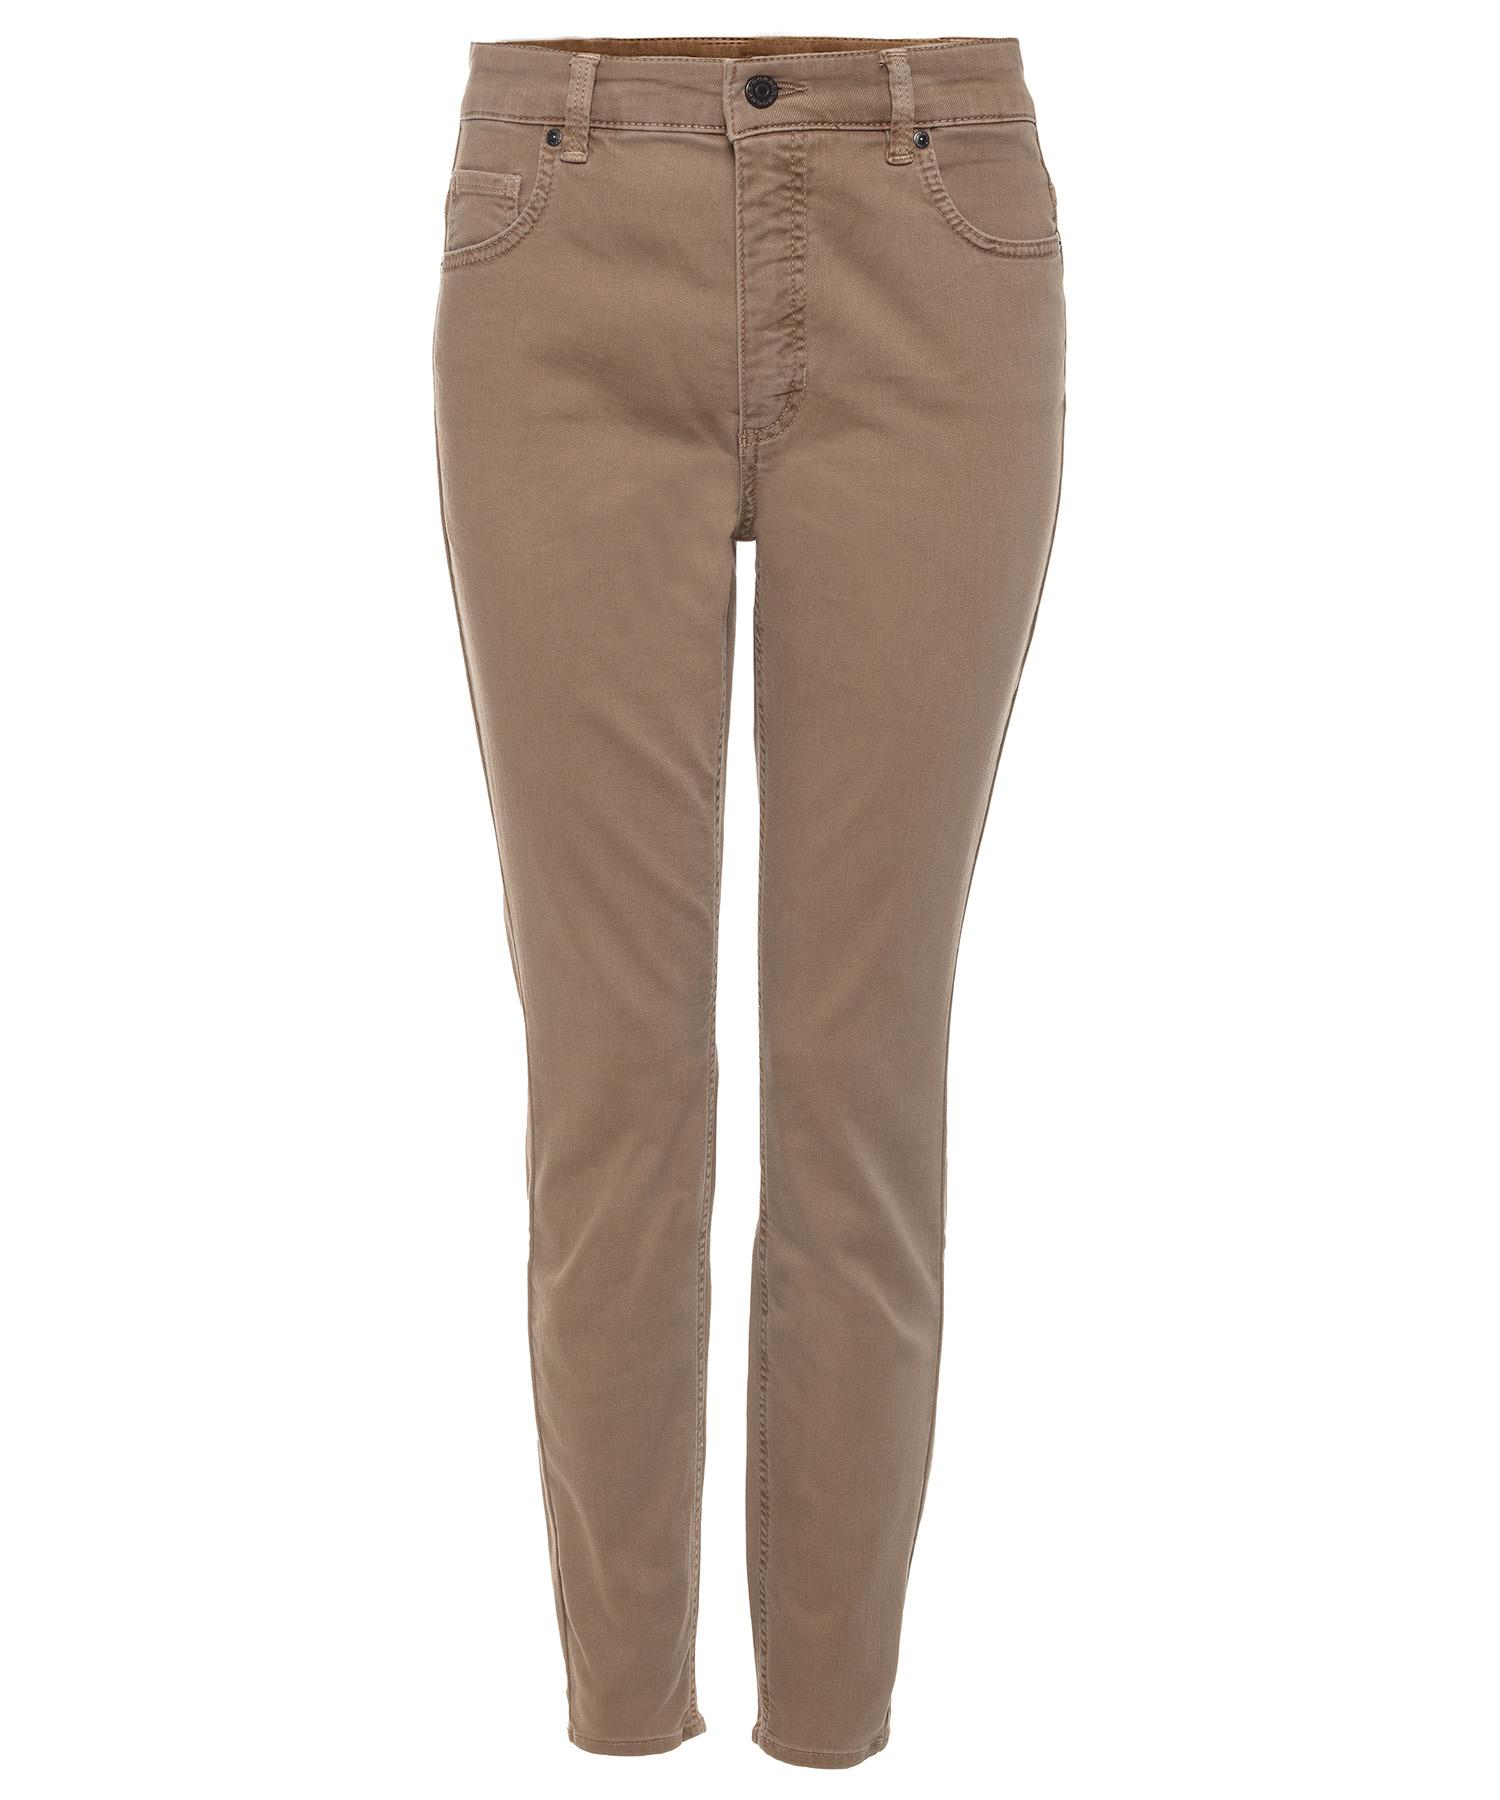 Rosner broek Audrey high waist